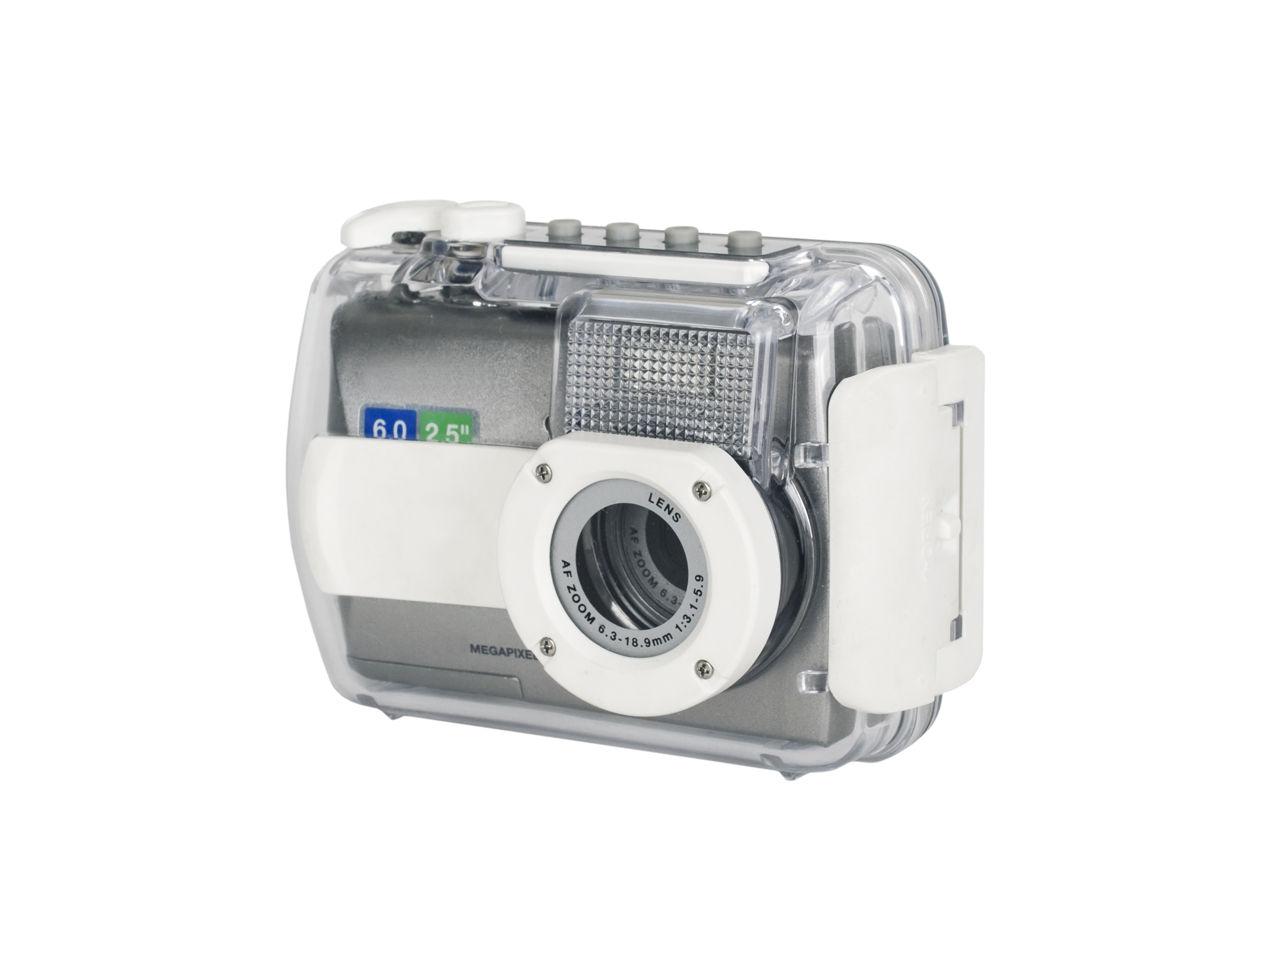 waterproof online digital photographic camera reviews